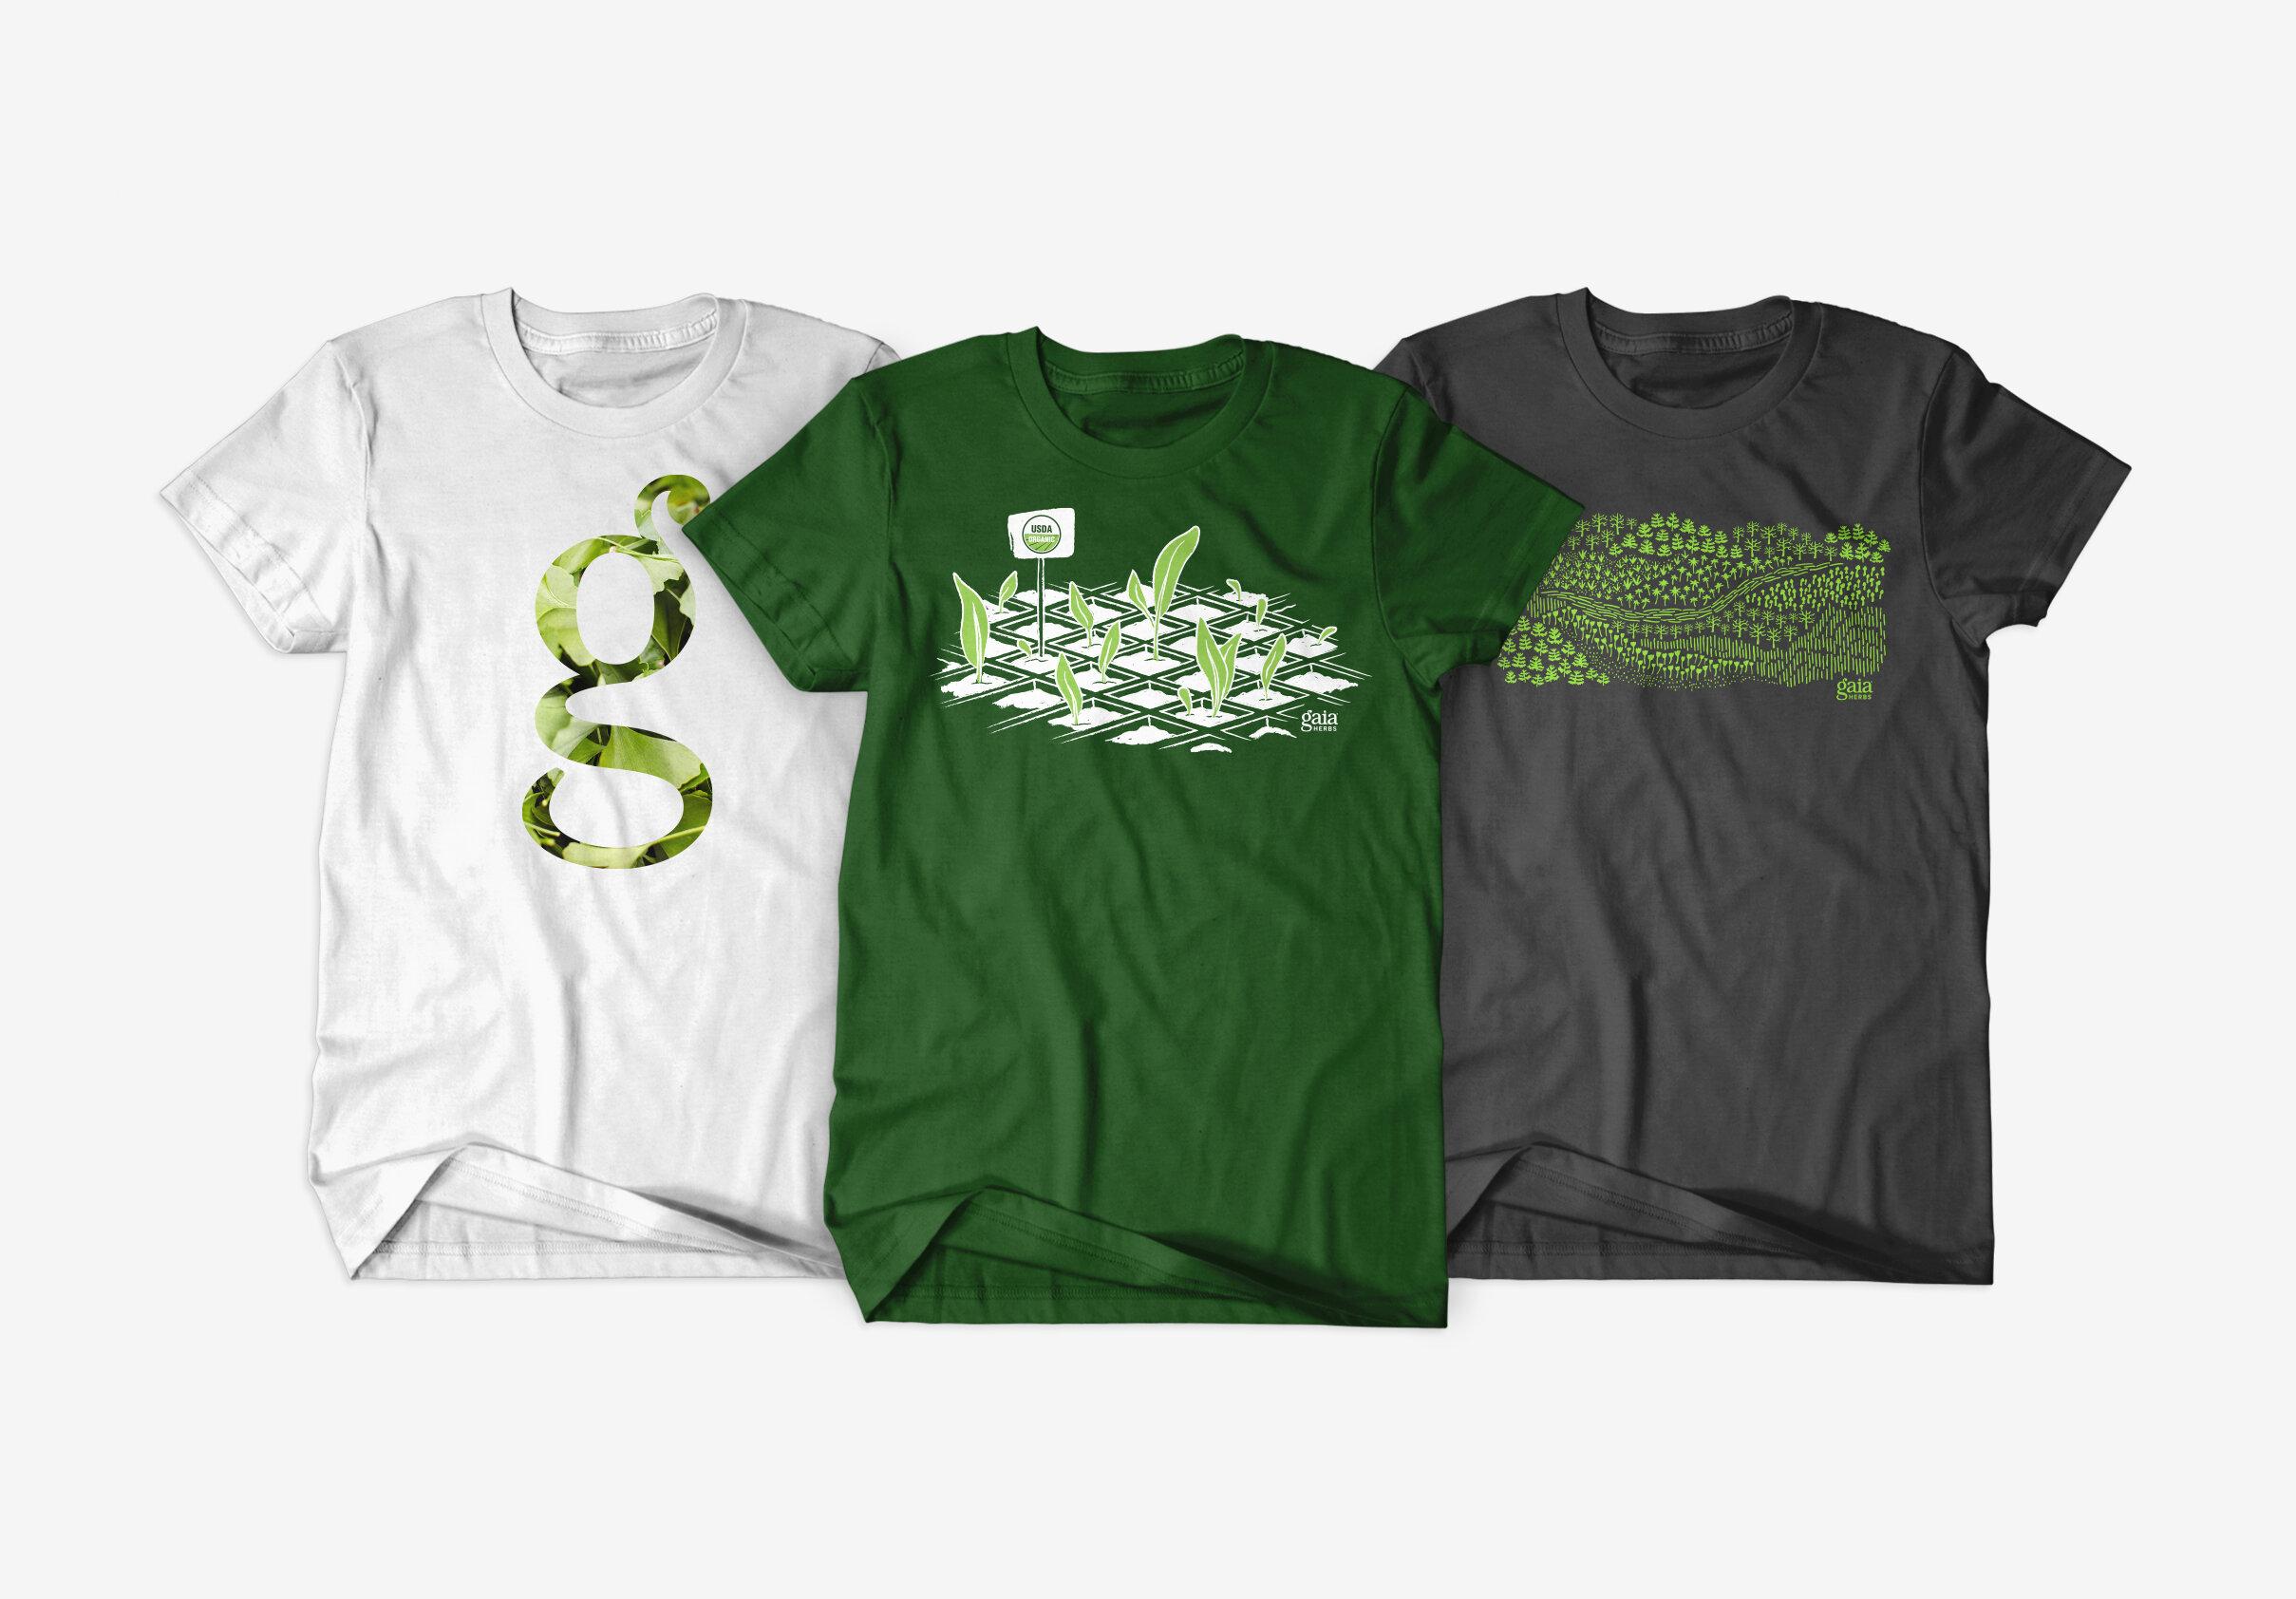 GaiaRebrand_Mockup_Tshirts.jpg